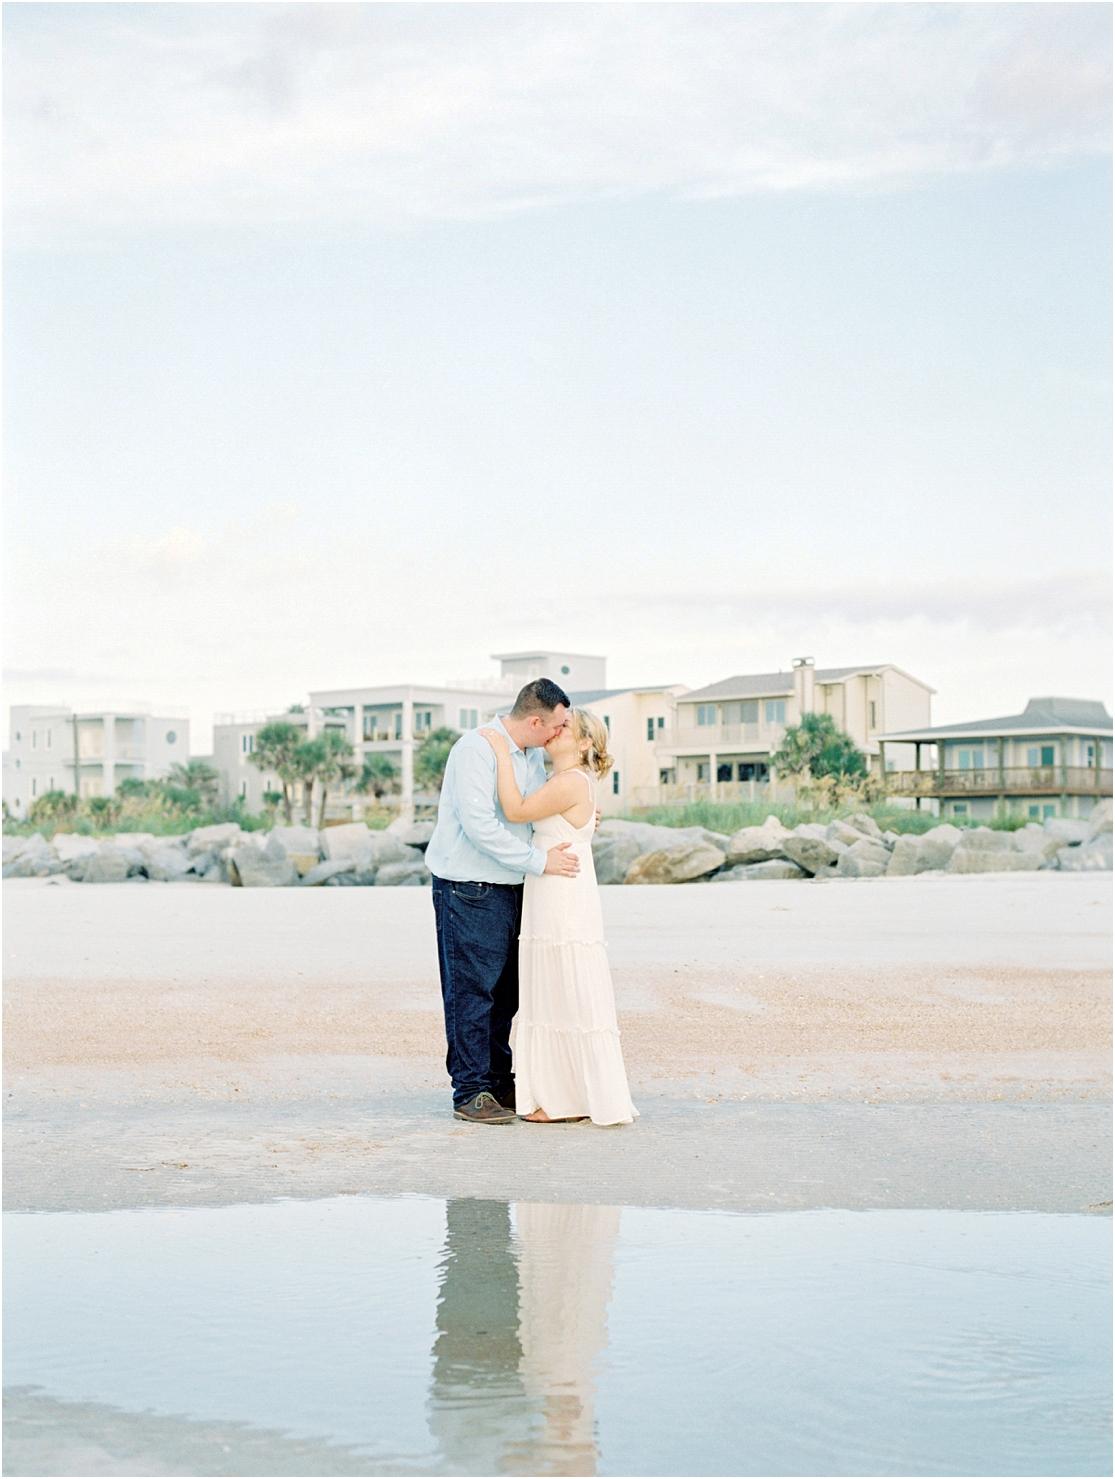 Lisa Silva Photography- Ponte Vedra Beach, St. Augustine and Jacksonville, Florida Fine Art Film Wedding Photography- Sunrise Engagement Session at  Vilano Beach_0017.jpg